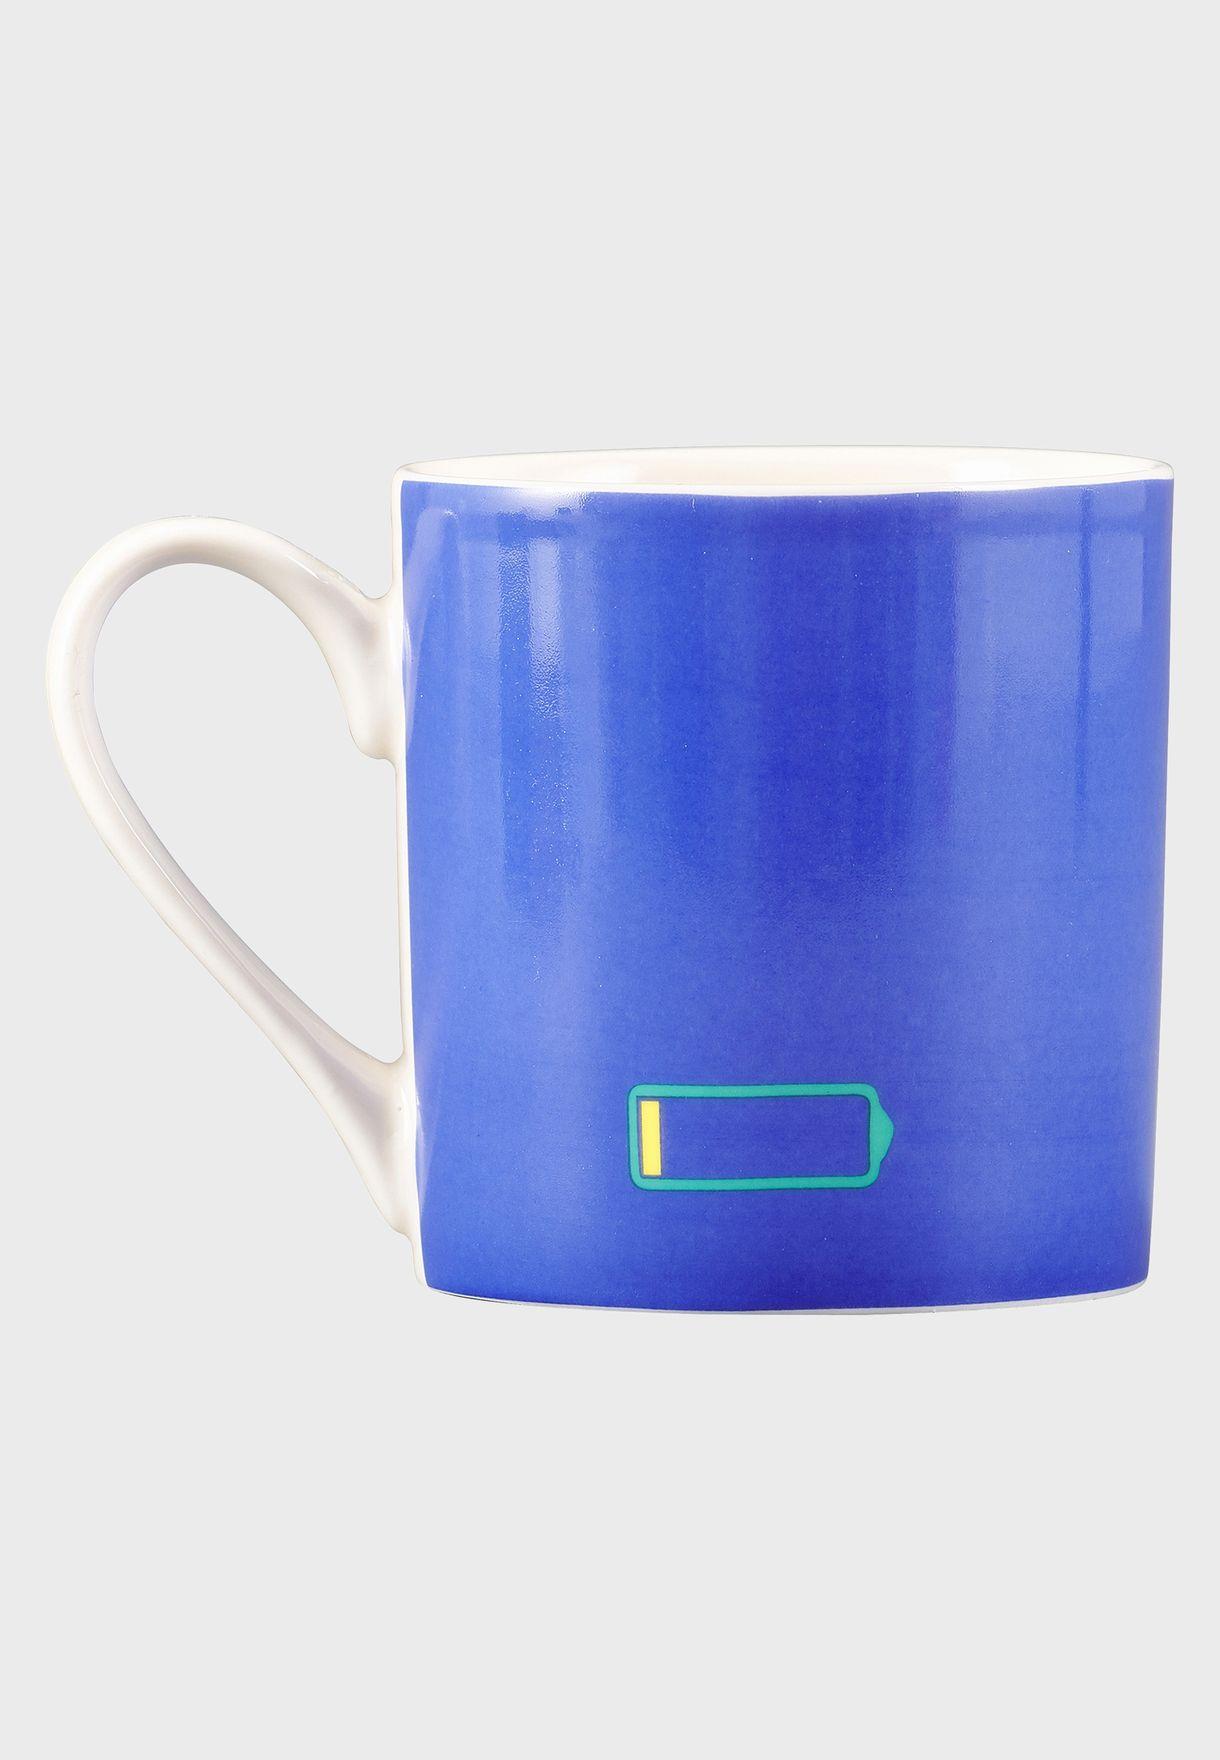 Busy Charging Mug